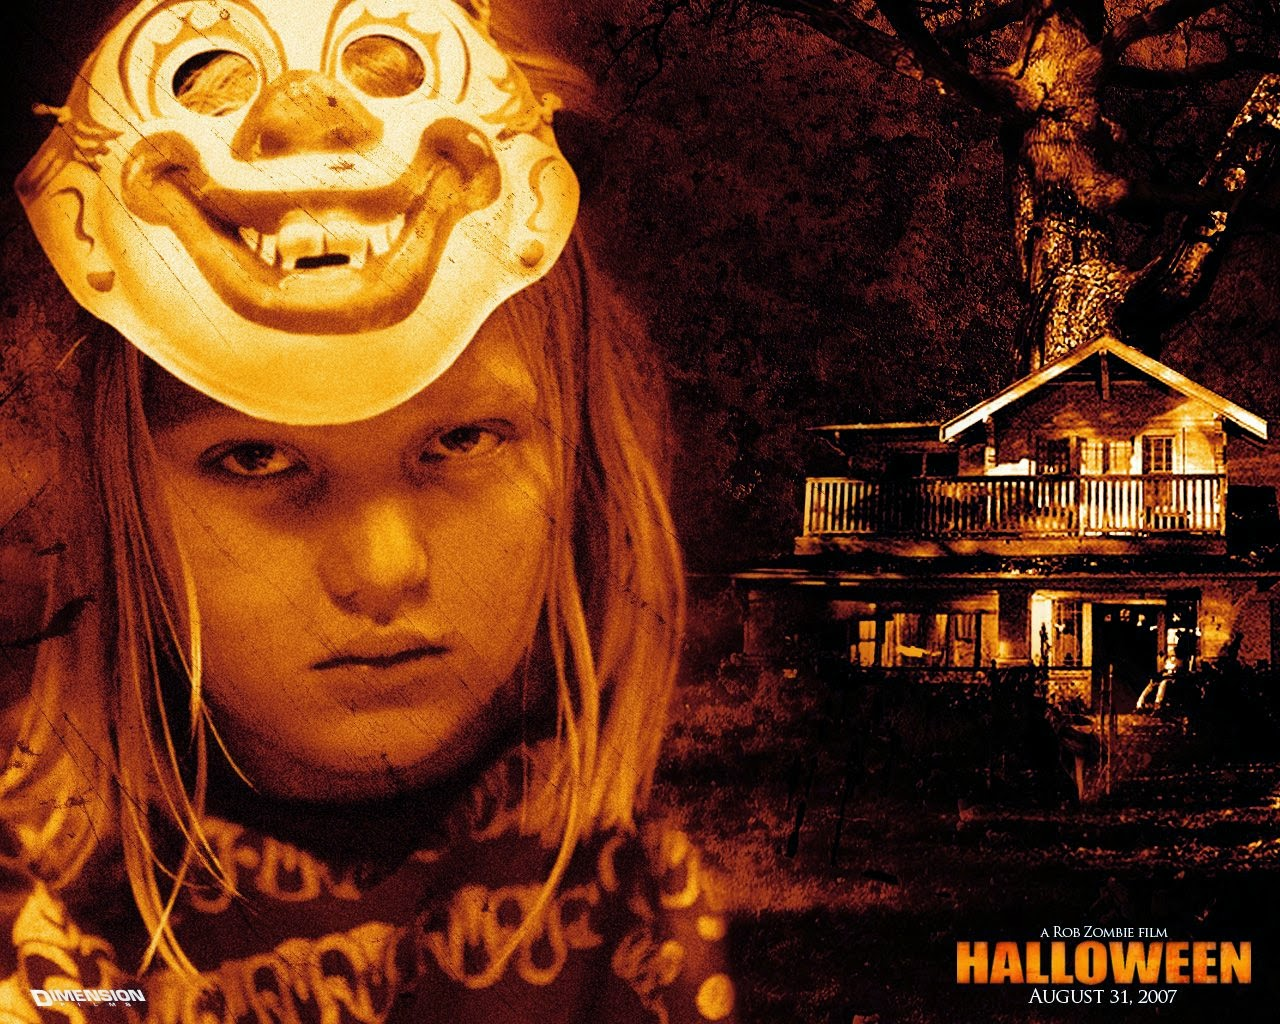 halloween 2 movie wallpaper - photo #22